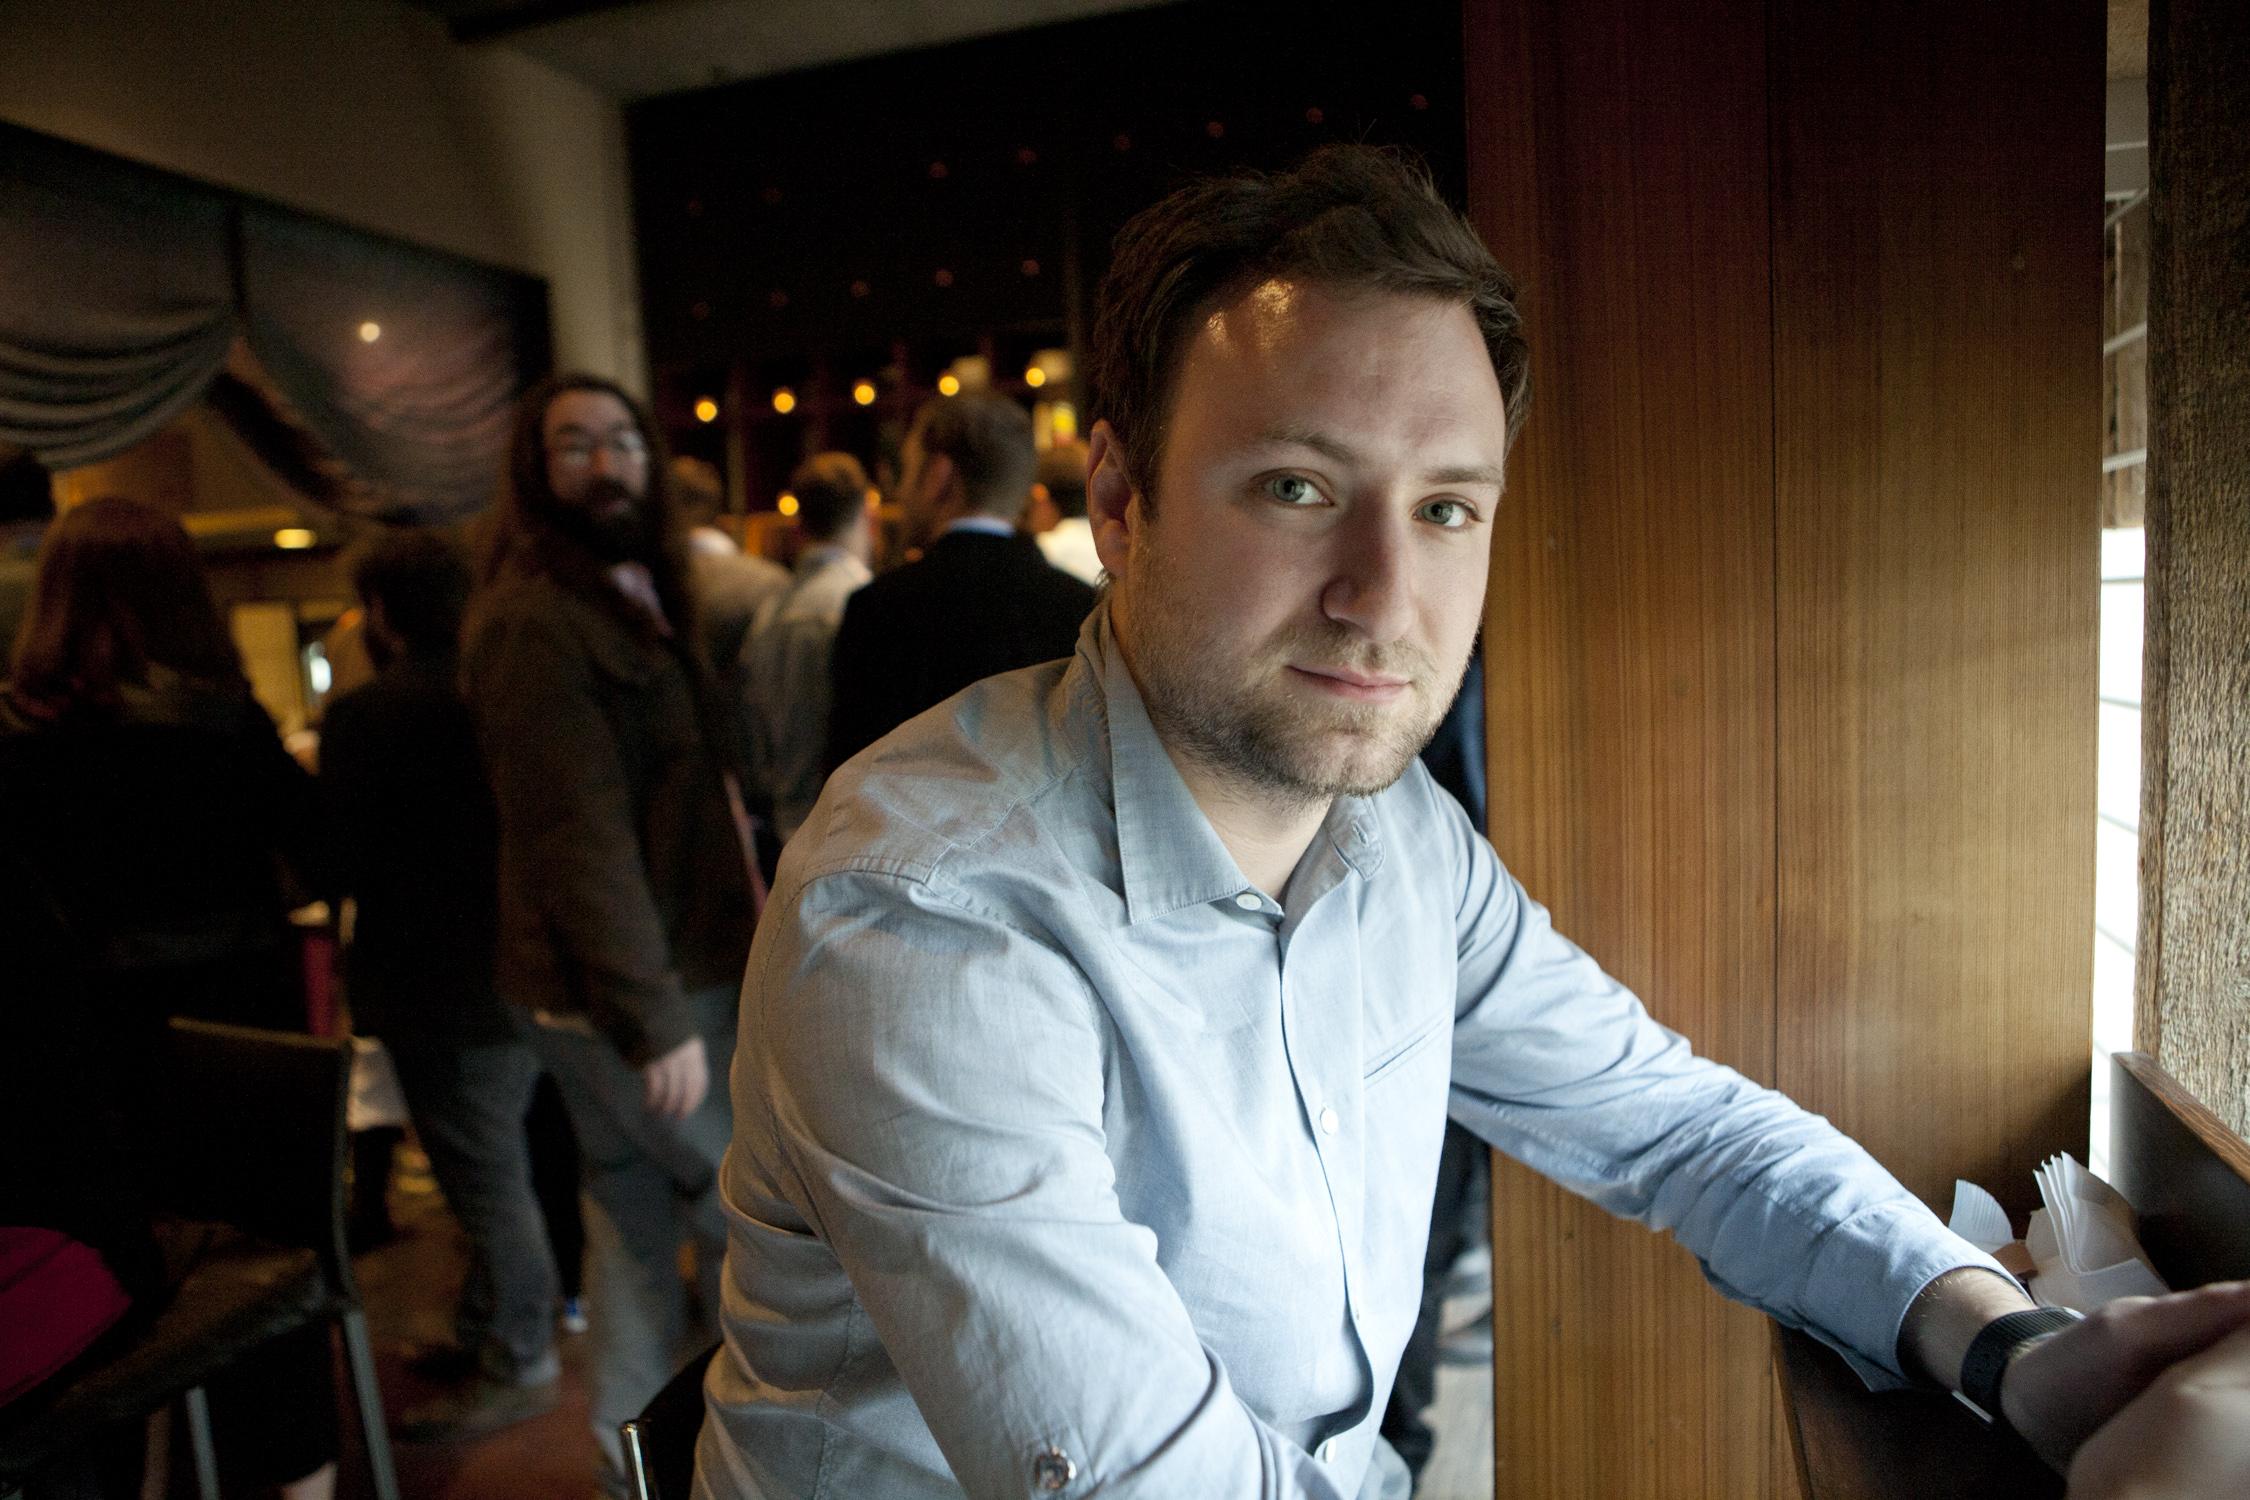 Chef's Table creator David Gelb